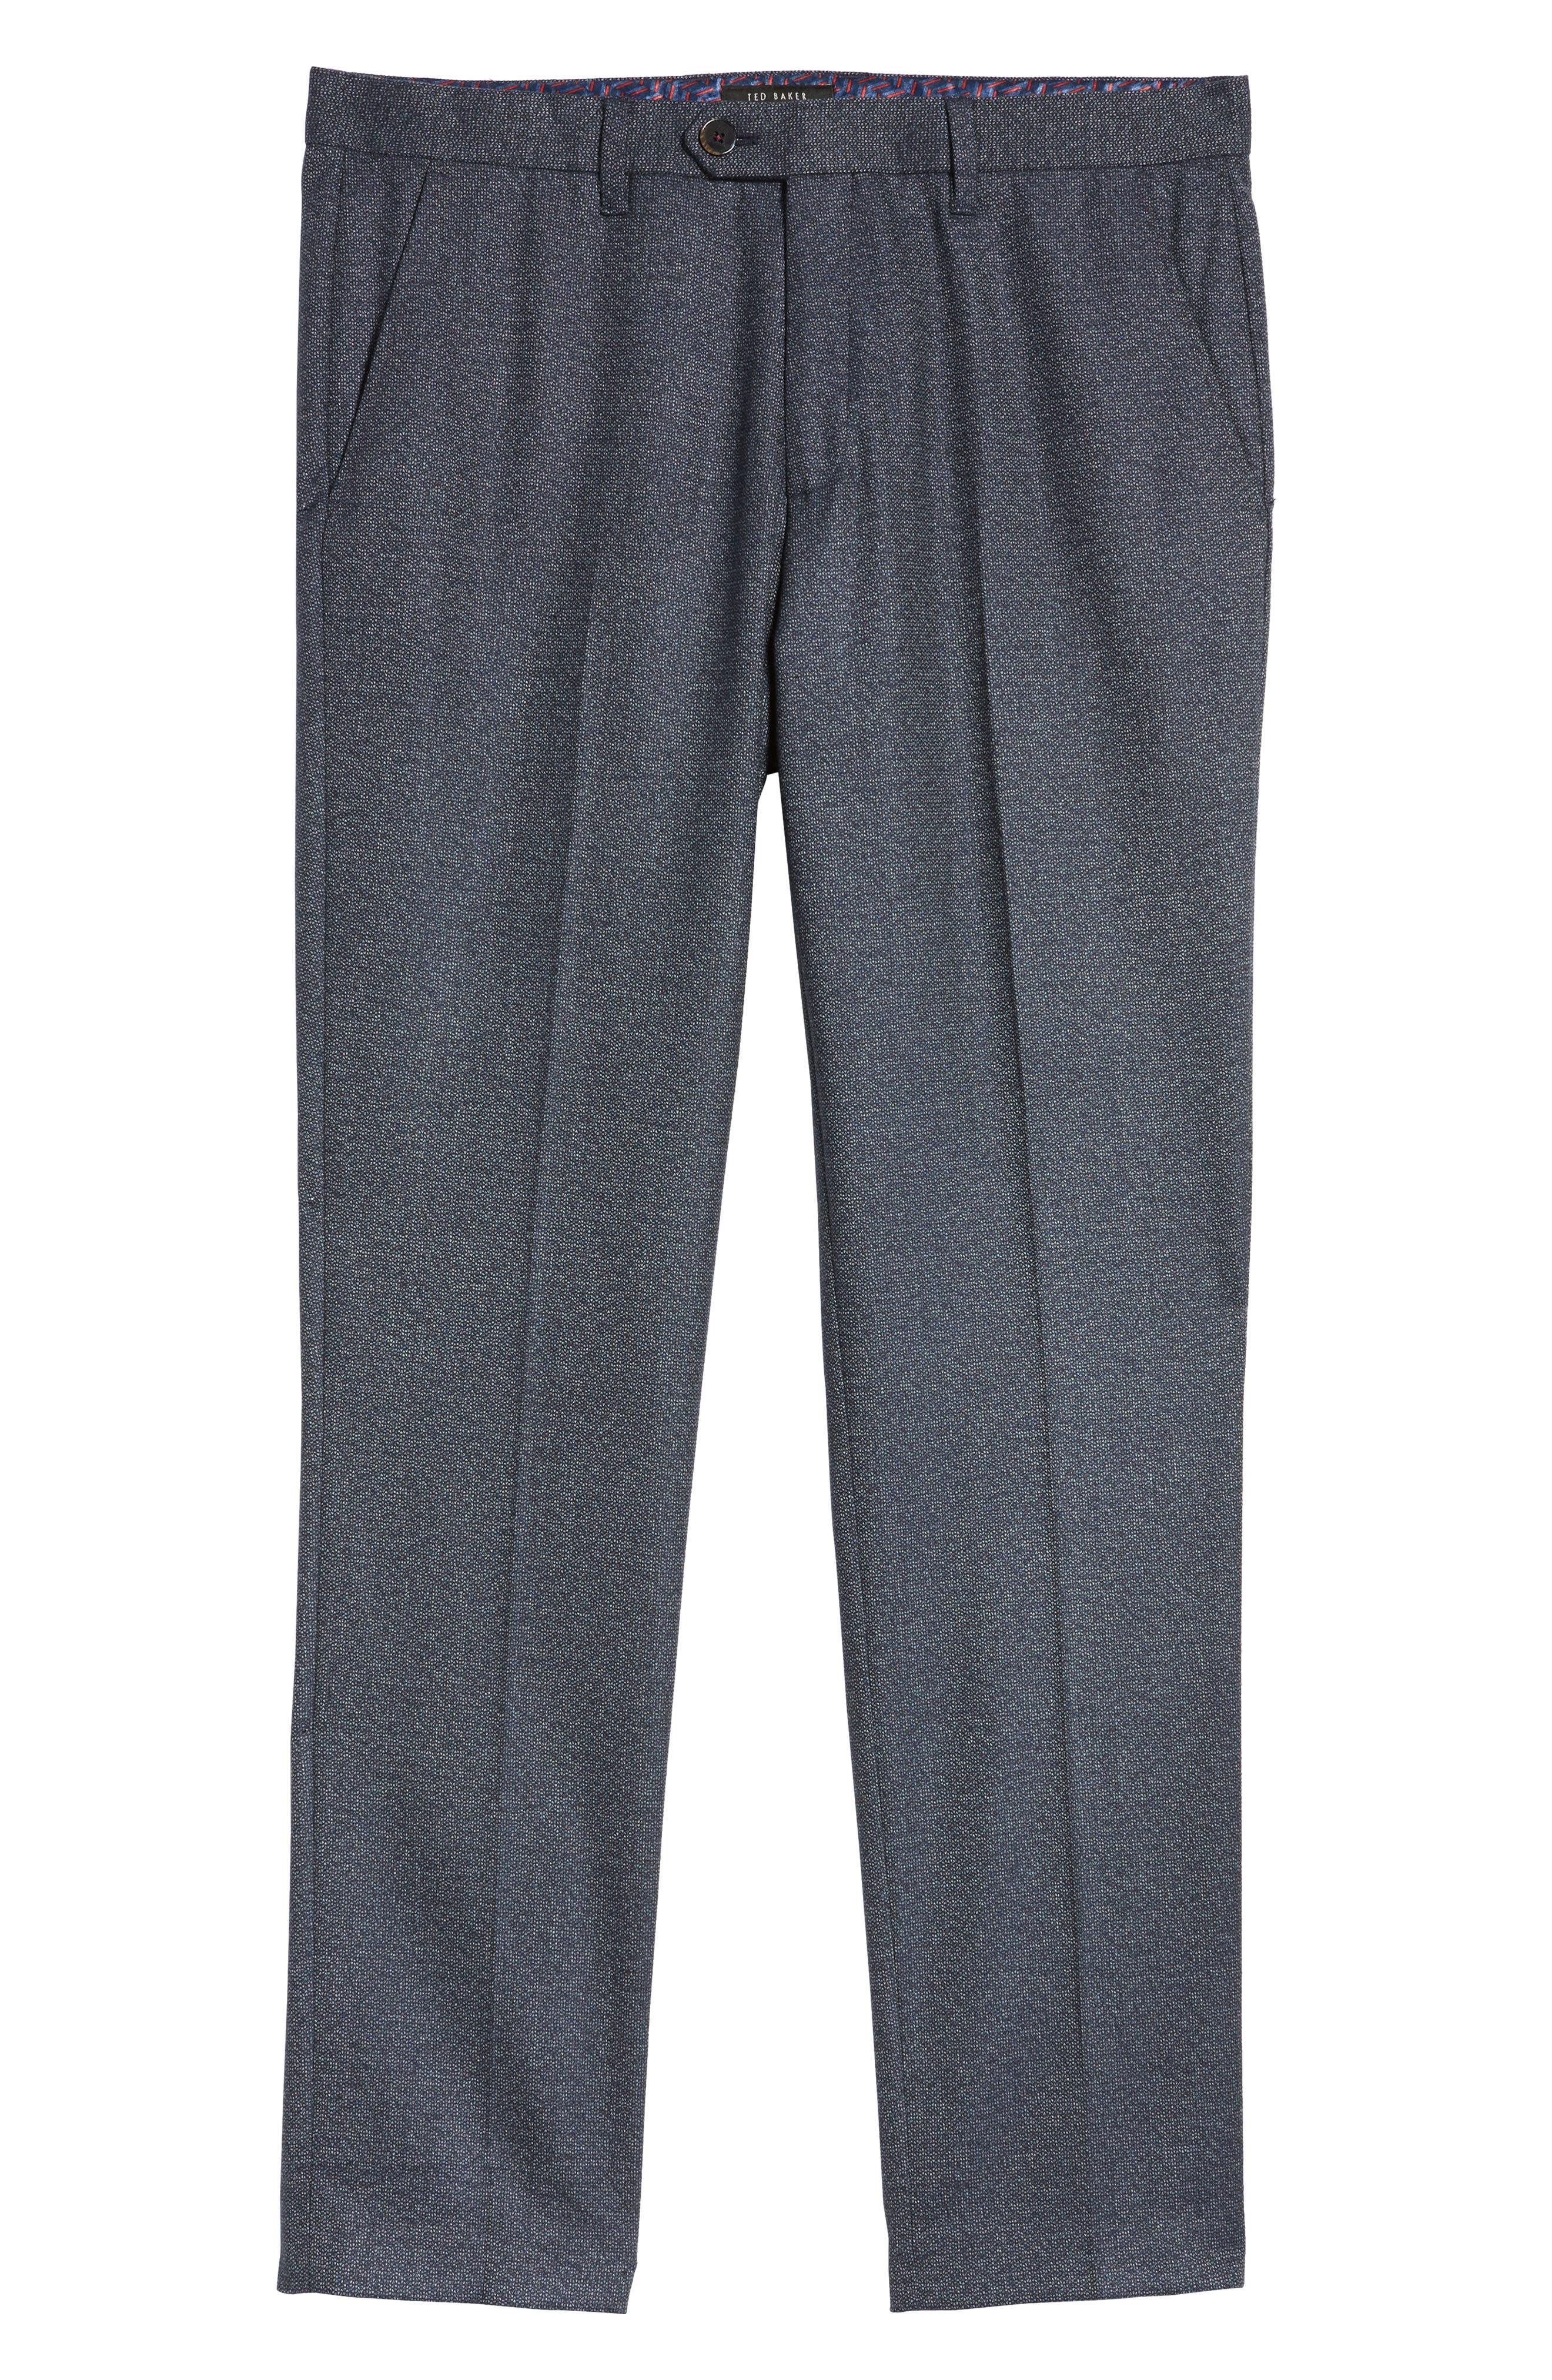 Beektro Trim Fit Trousers,                             Alternate thumbnail 6, color,